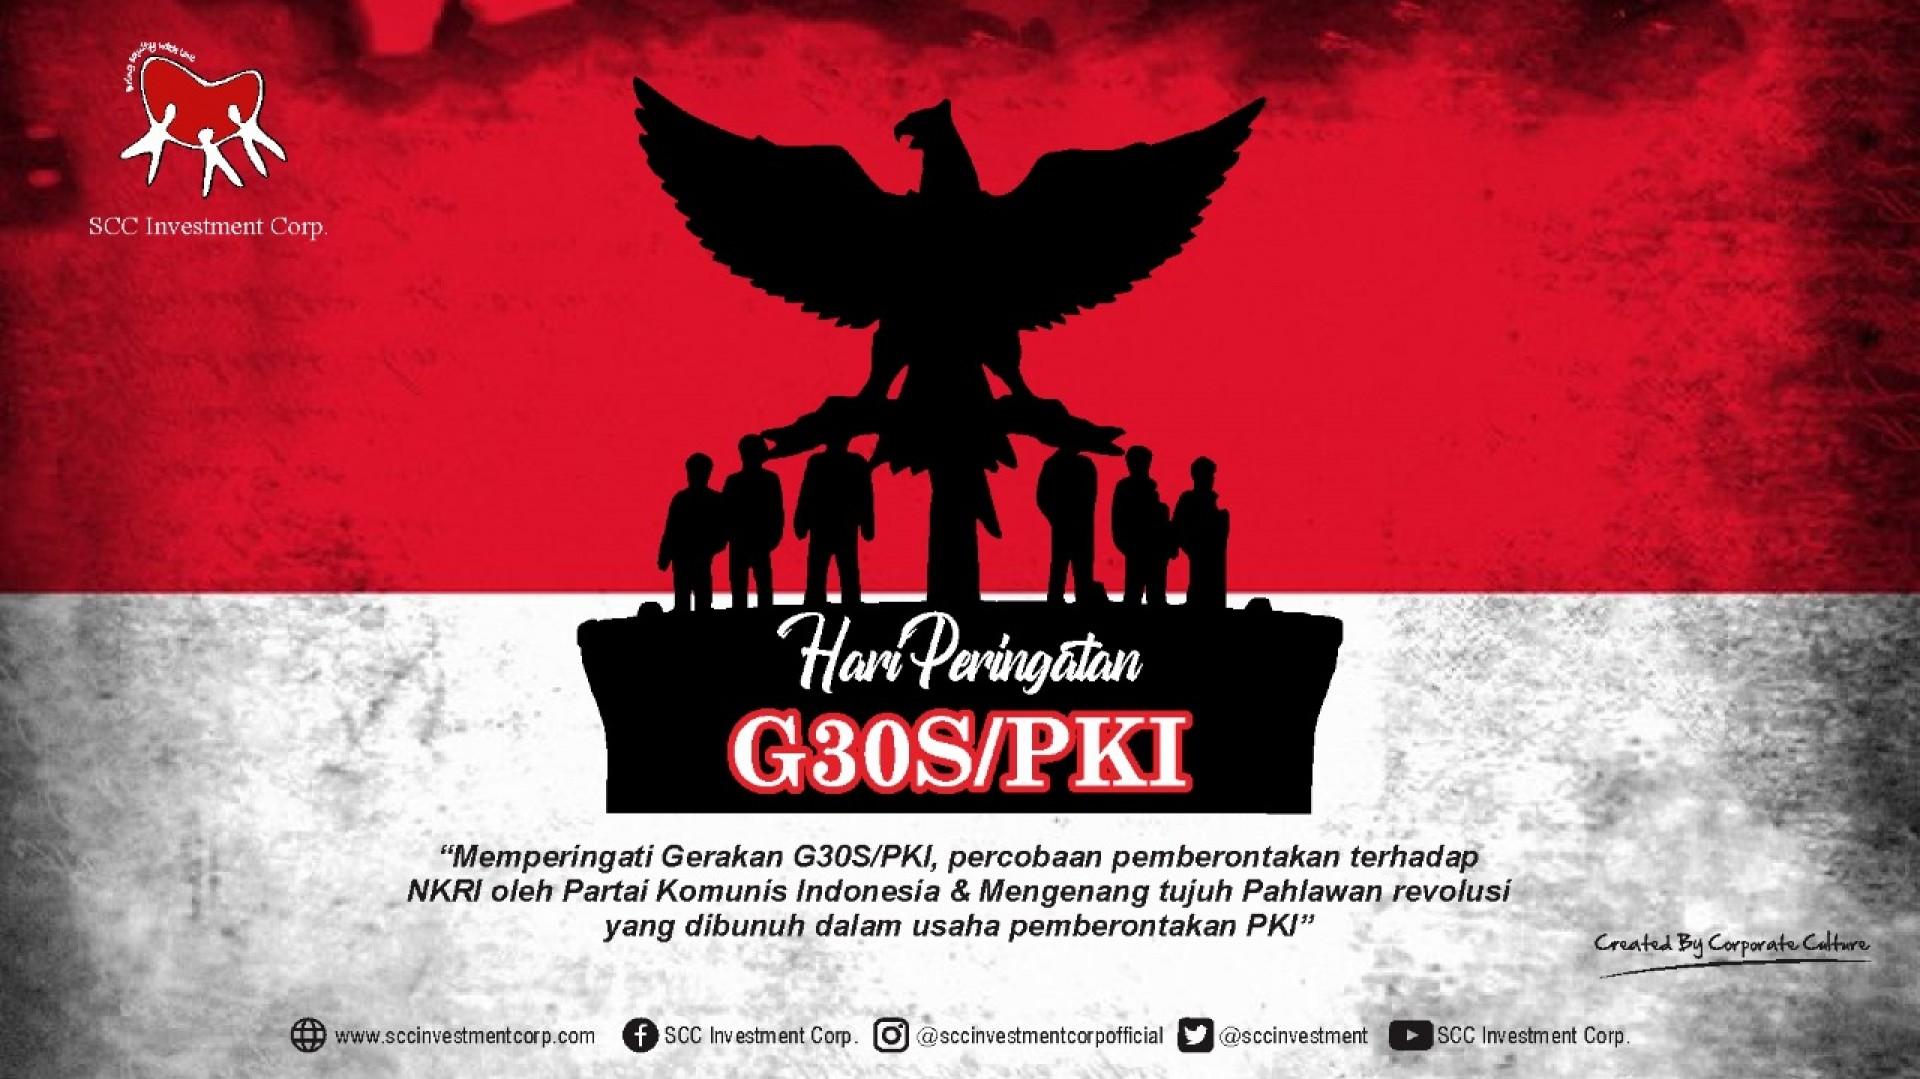 Mari mengenang sejarah singkat dan nilai moral pada peristiwa kelam G30S / PKI